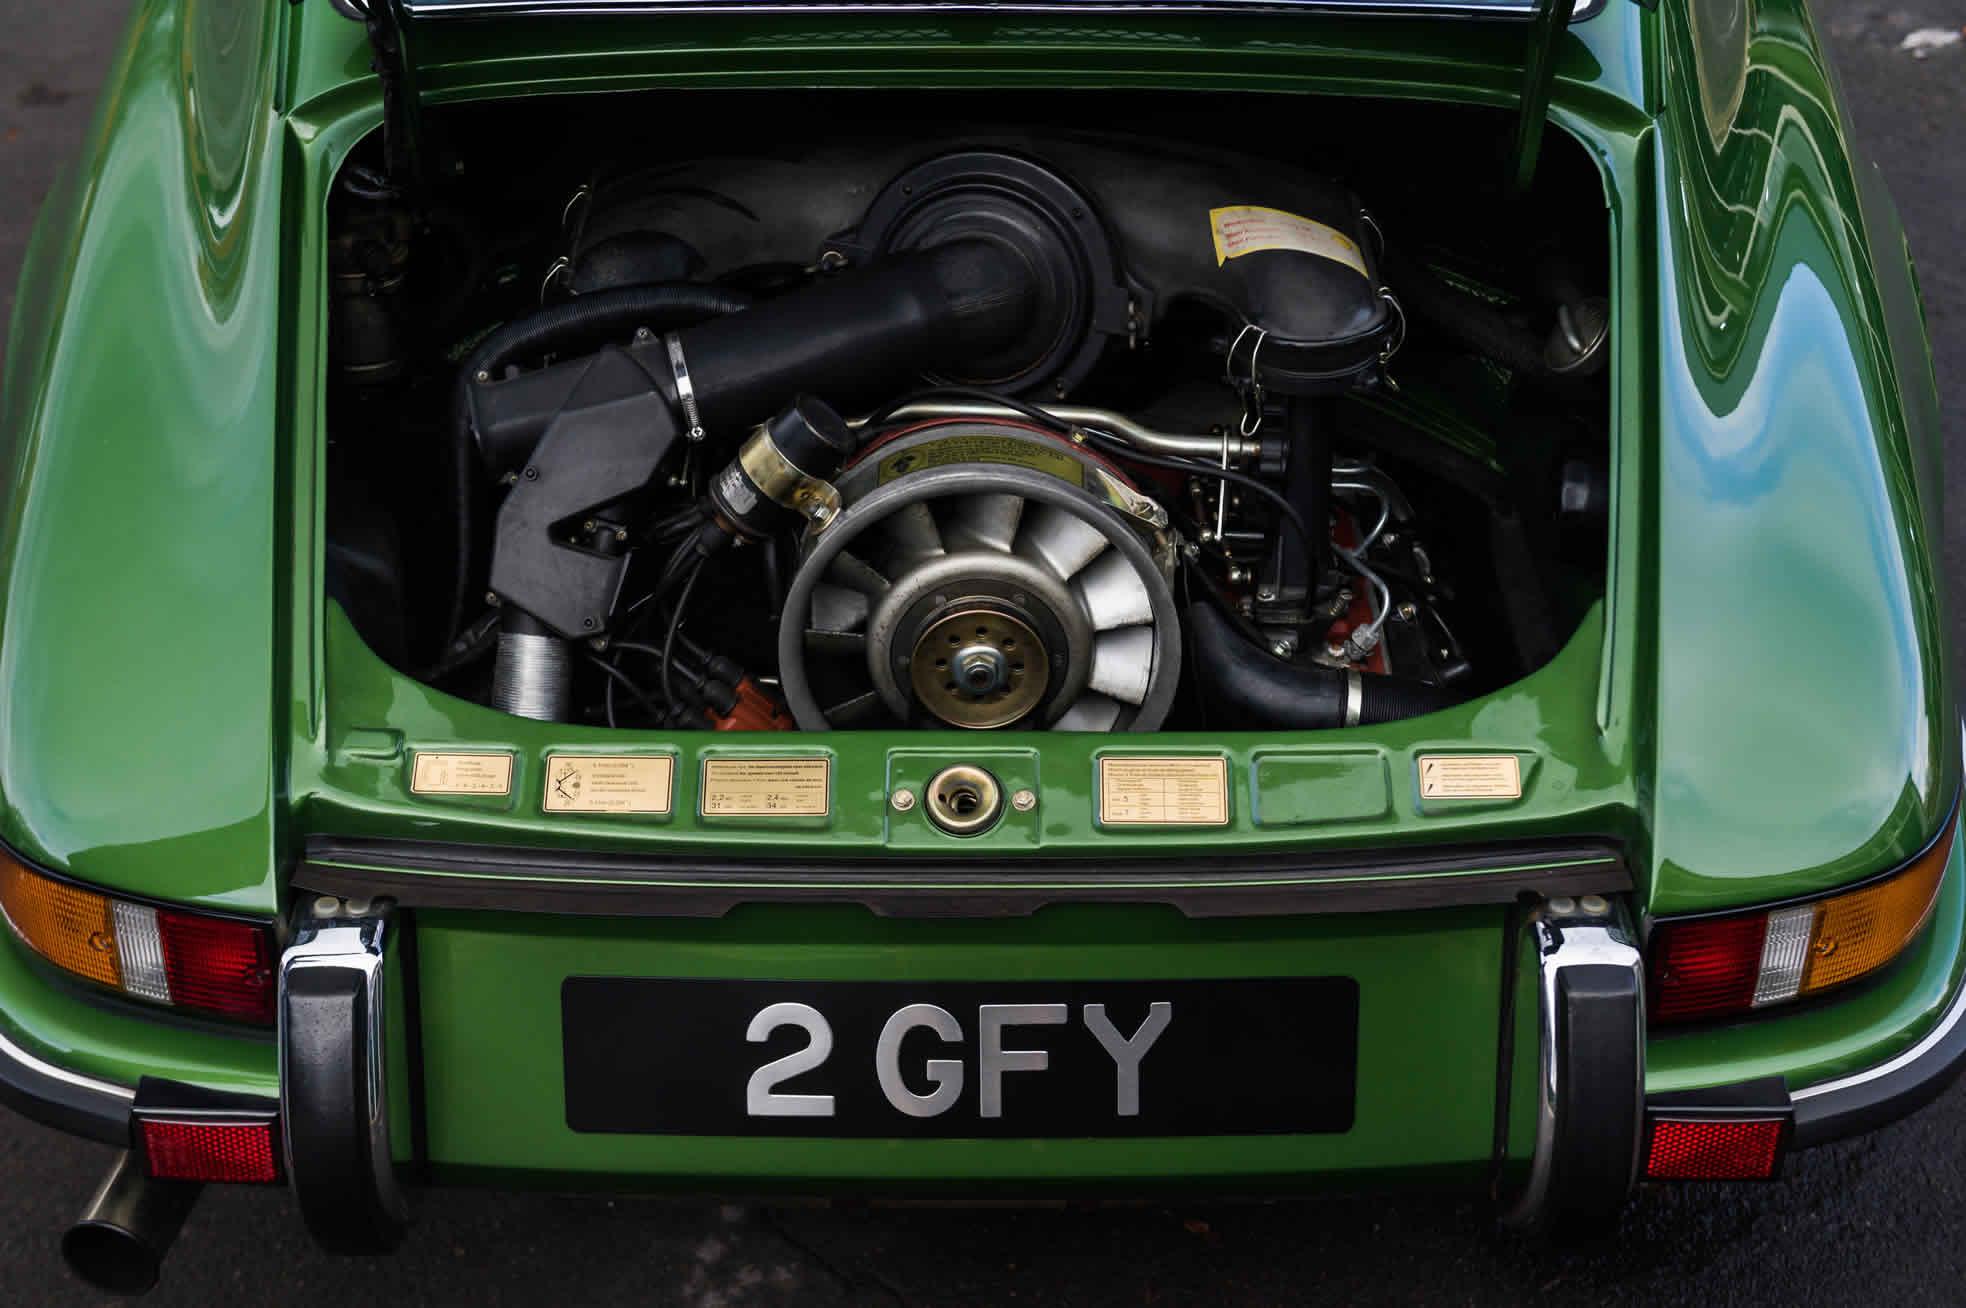 1973 Porsche 911S 2.4. For Sale Sports Purpose, Bicester Heritage, Oxon.